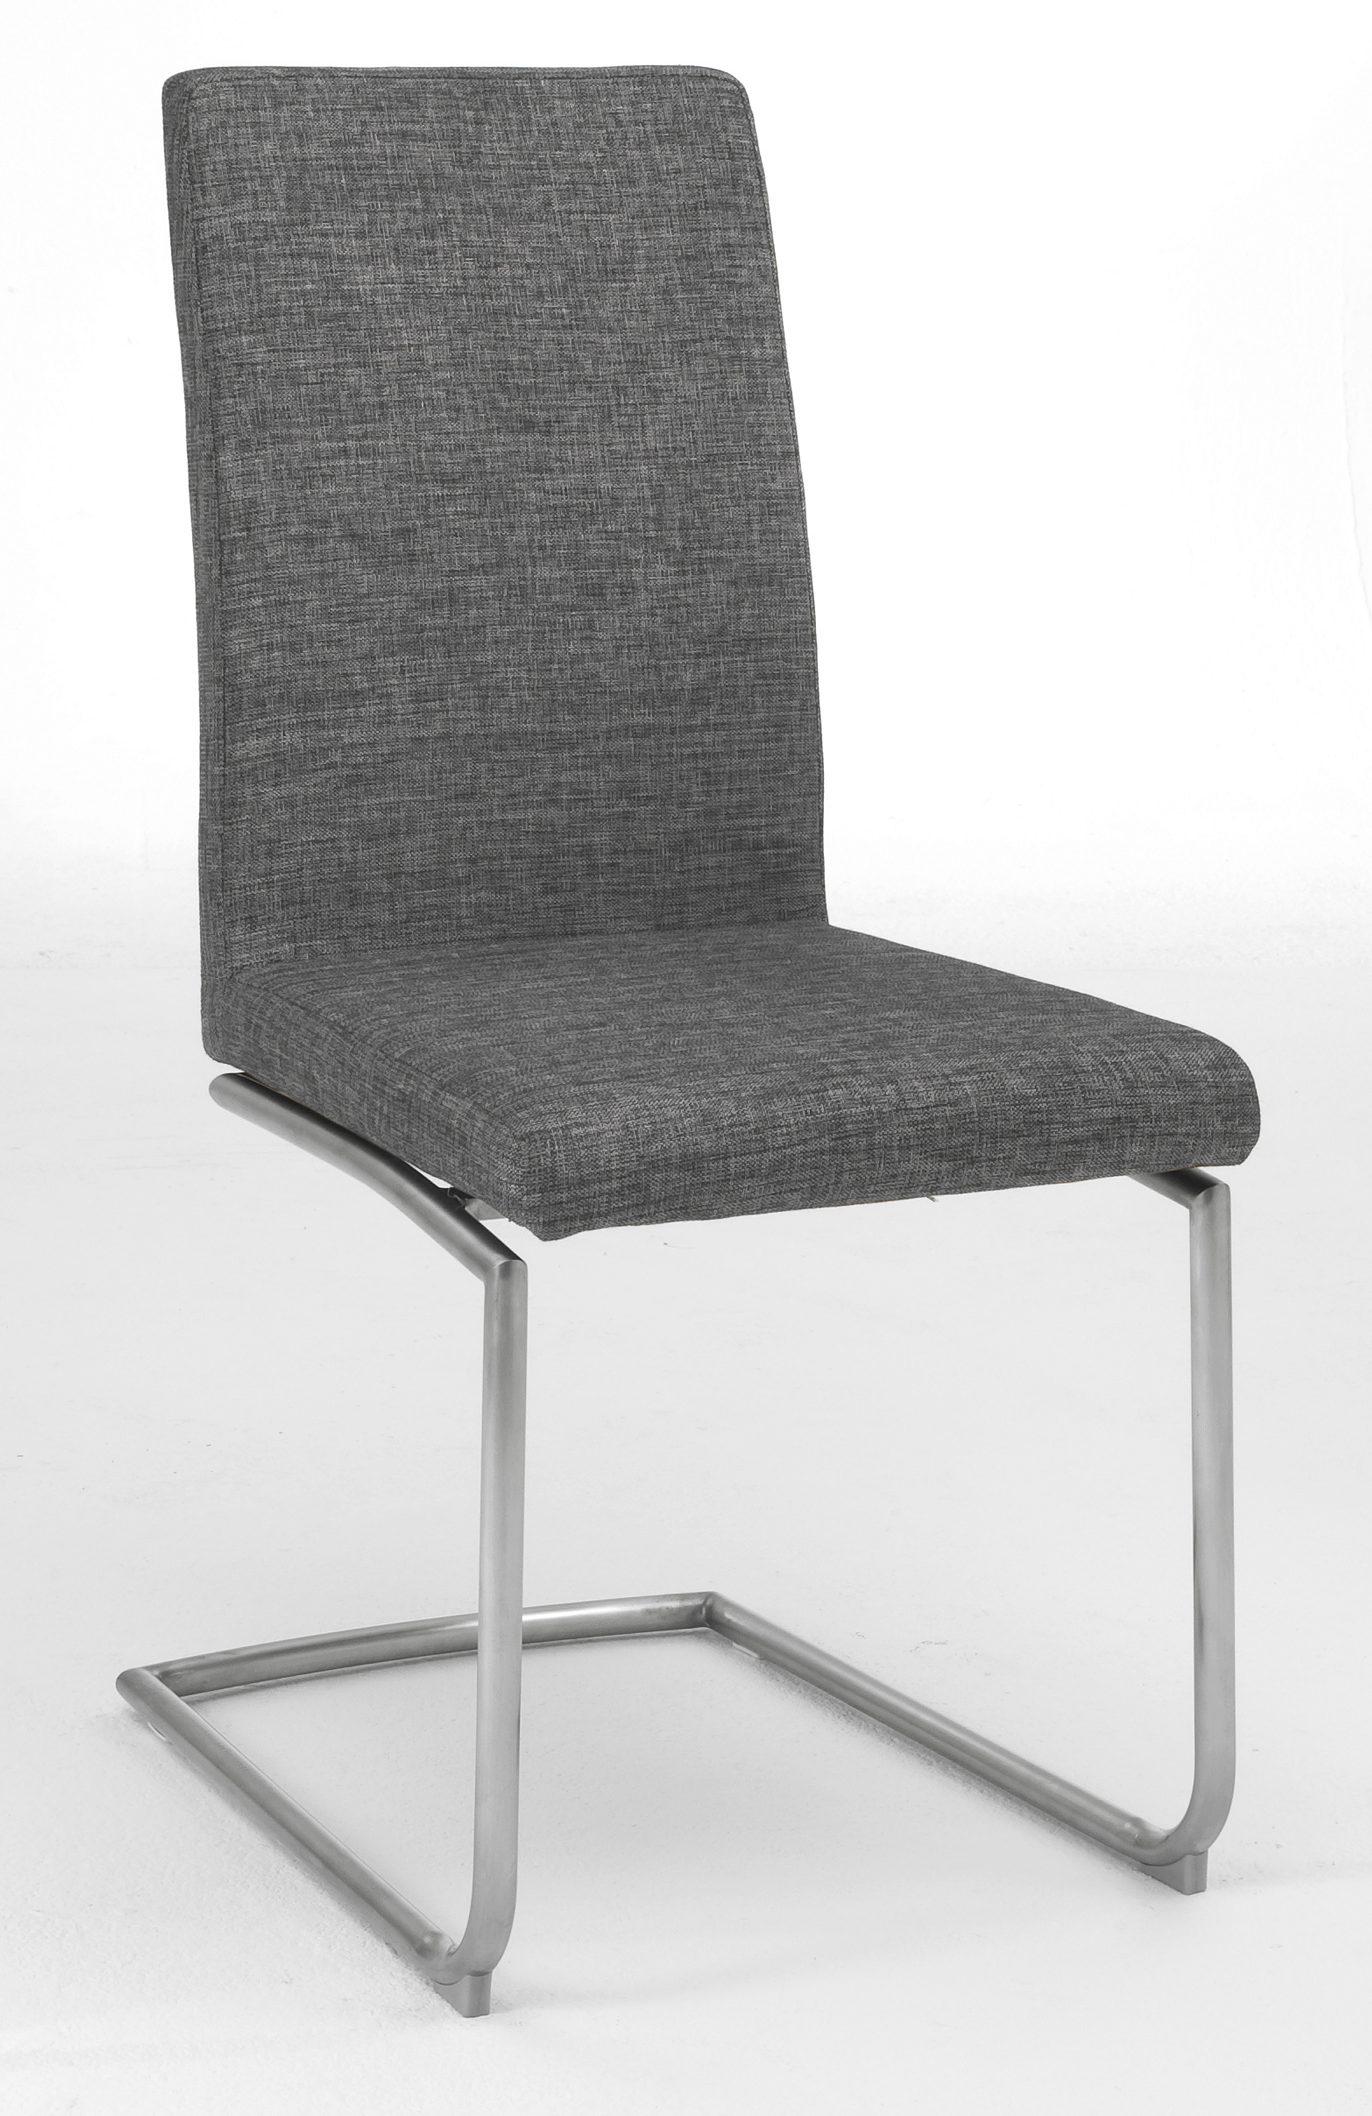 stuhl esszimmer design hausgestaltung ideen. Black Bedroom Furniture Sets. Home Design Ideas